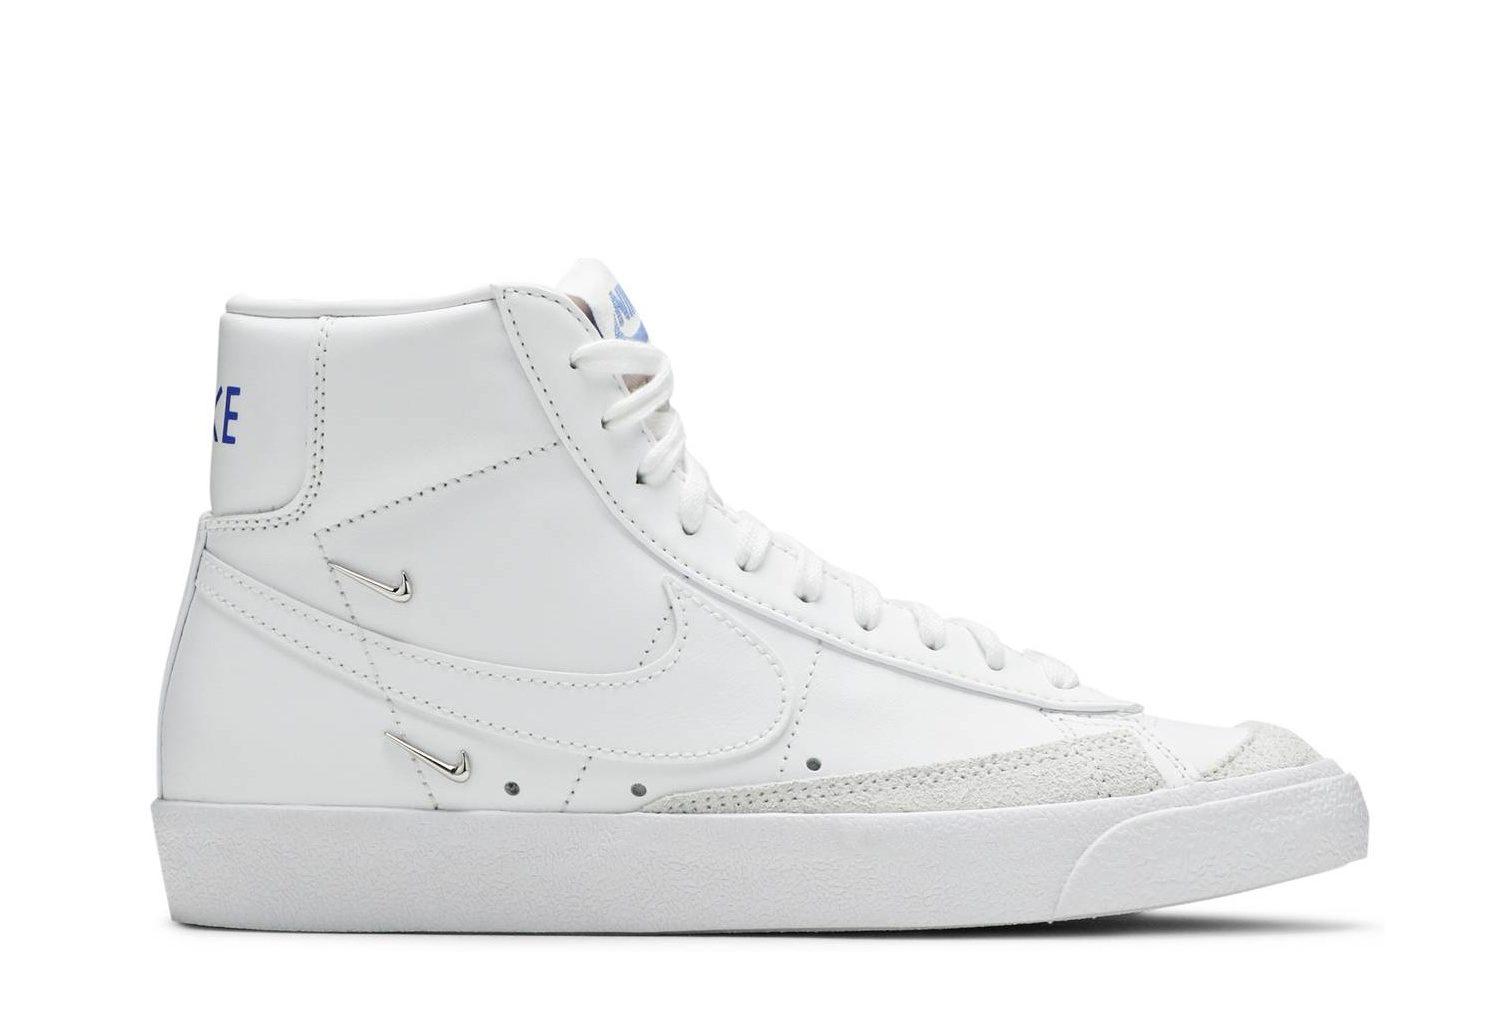 5Krossovki-Nike-Blazer-Mid-77-SE-Sisterhood-White-e1625782362467